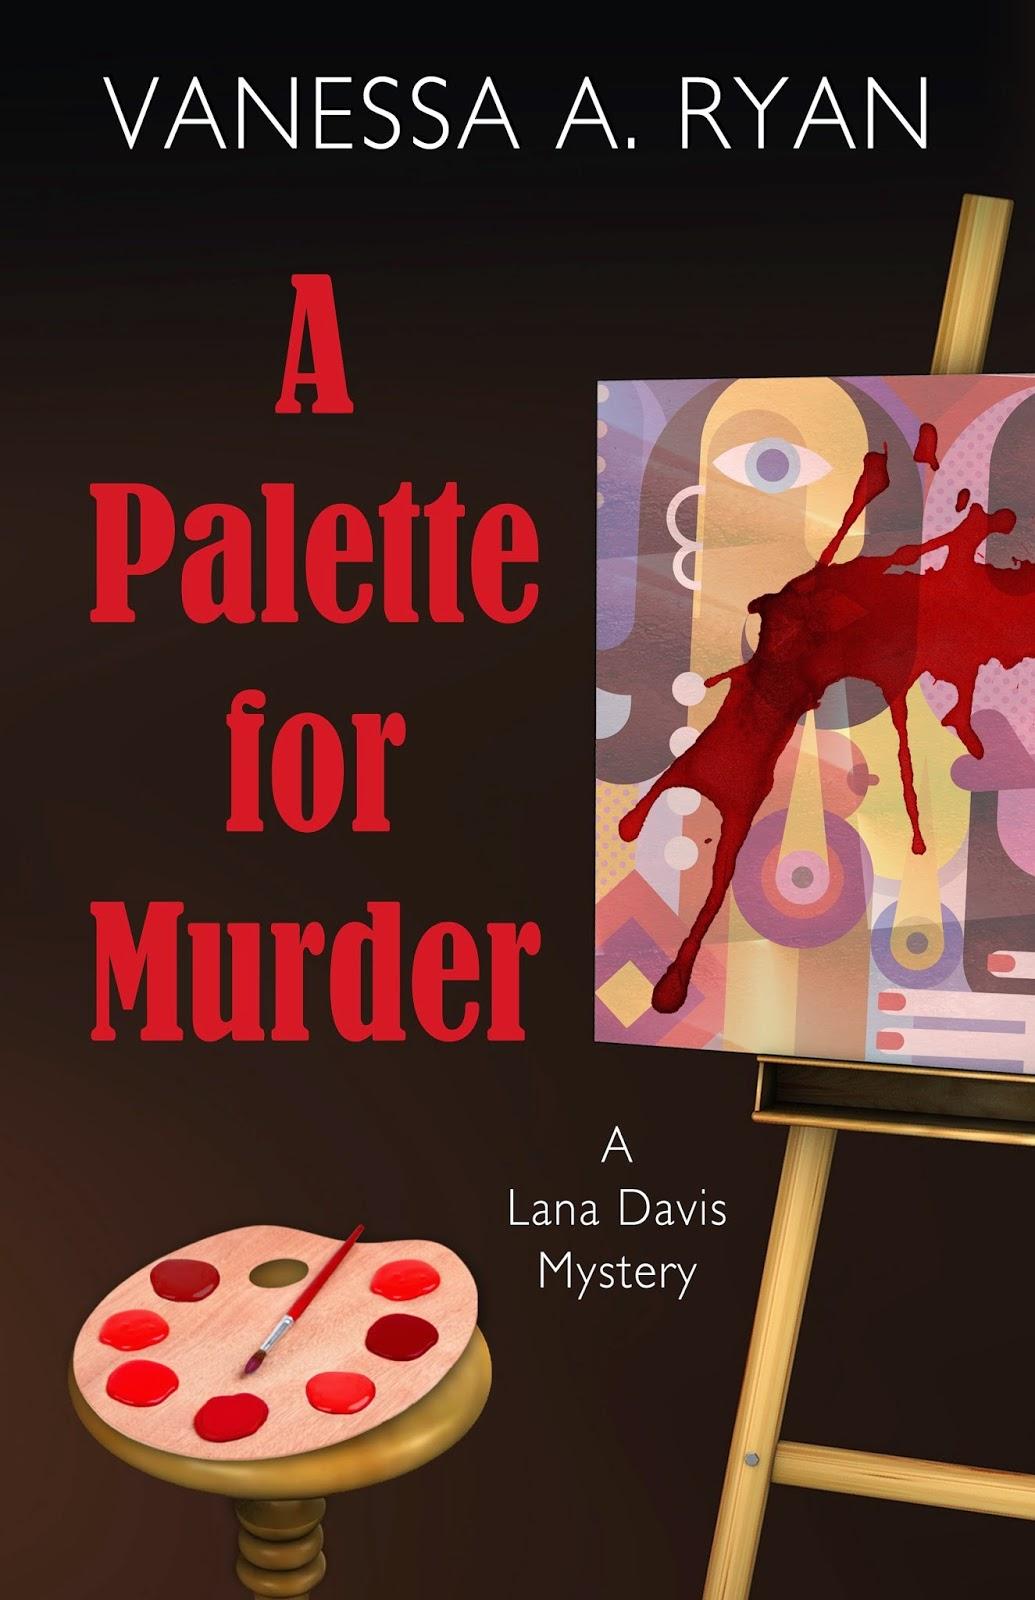 http://www.amazon.com/Palette-Murder-Lana-Davis-Mystery-ebook/dp/B00VRXXSO4/ref=sr_1_3?s=digital-text&ie=UTF8&qid=1429385482&sr=1-3&keywords=vanessa+a+ryan